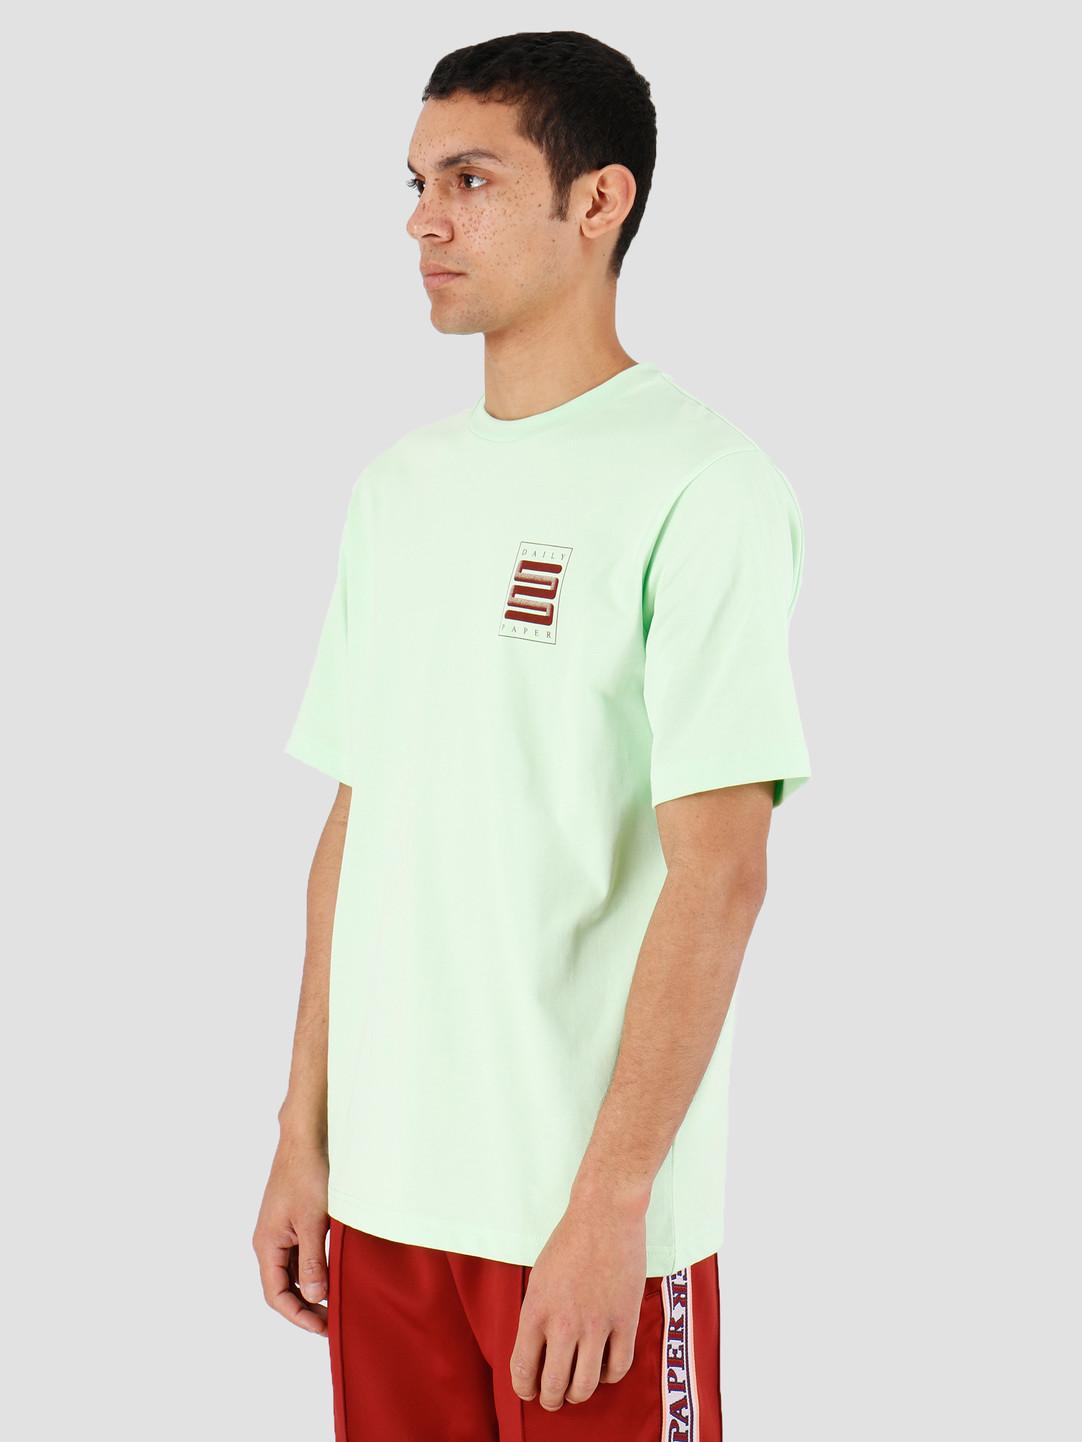 Daily Paper Daily Paper Horpat T-shirt Patina Green 20S1TS01-01